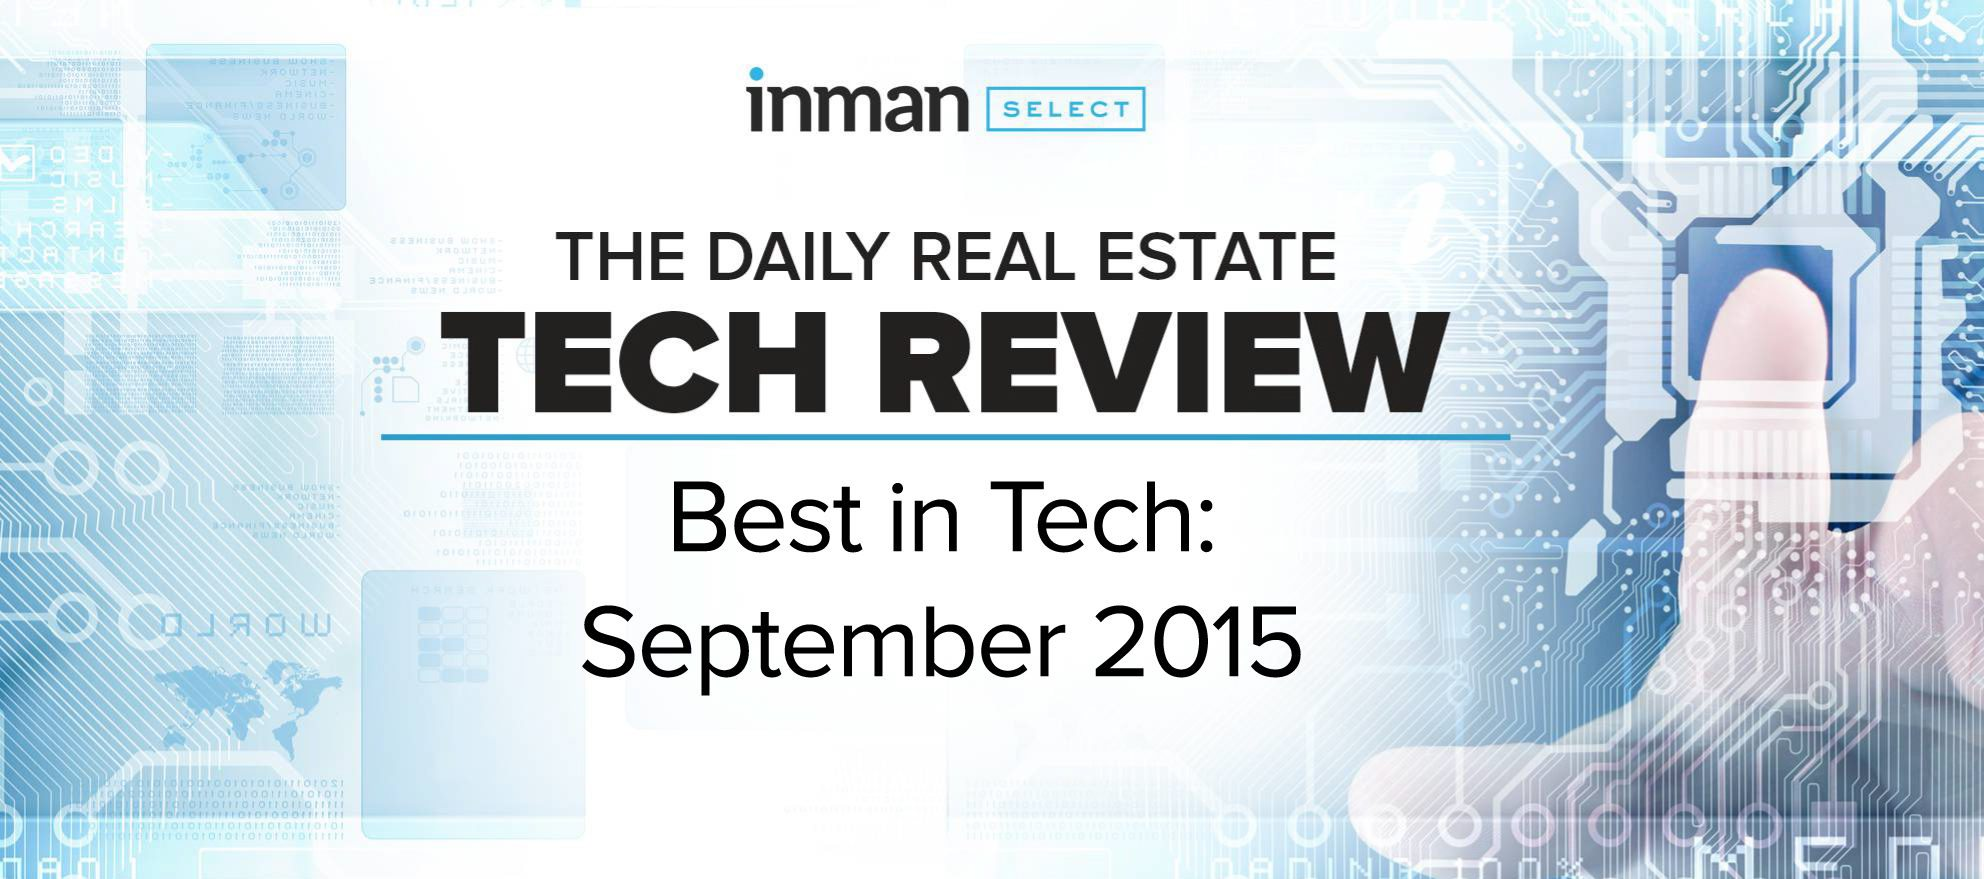 Best in real estate tech: September 2015